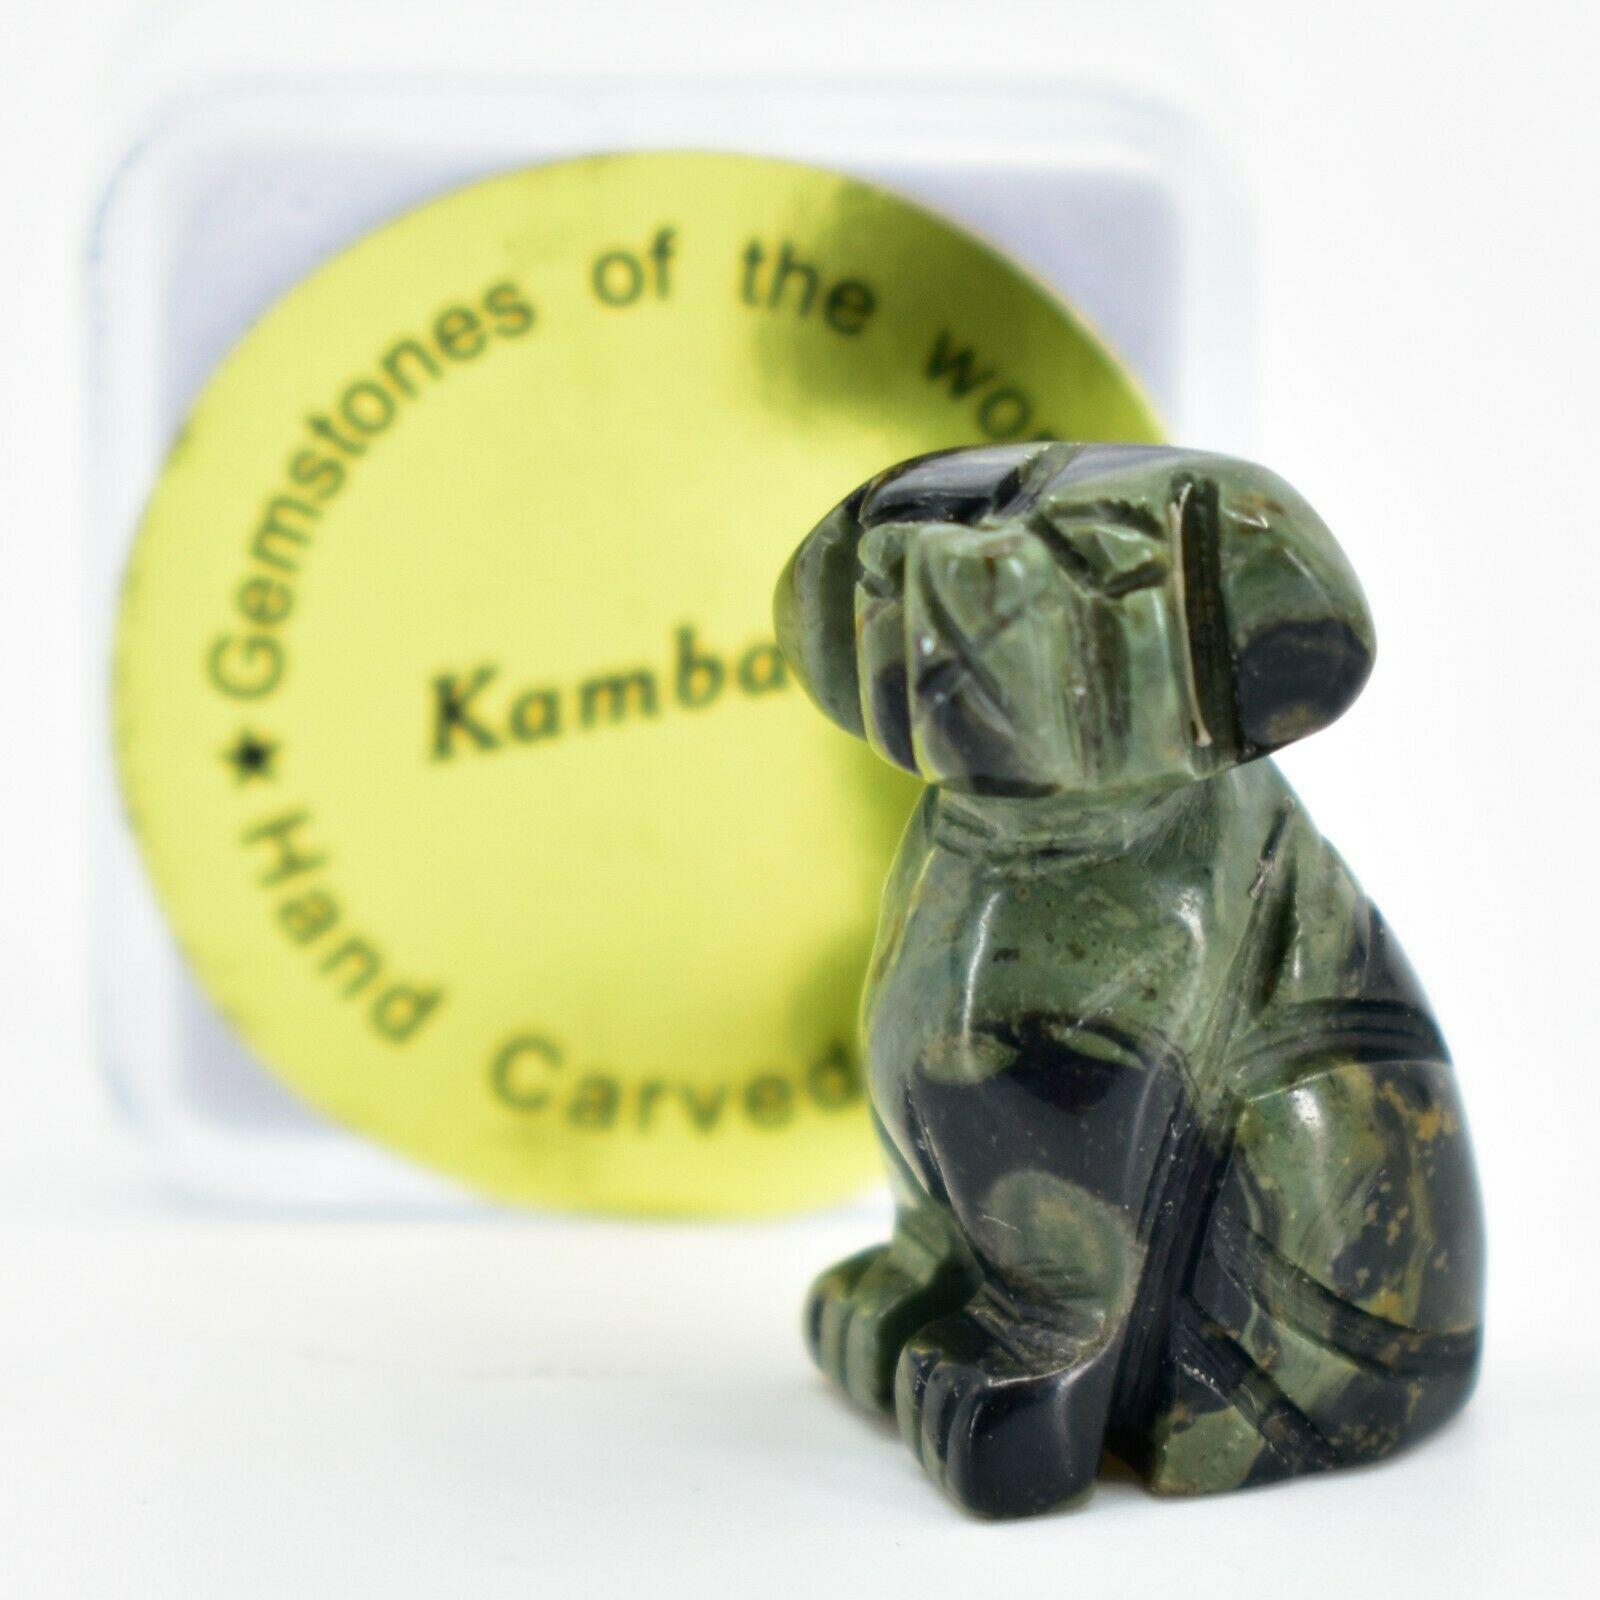 Kambaba Jasper Gemstone Tiny Miniature Puppy Dog Figurine Hand Carved in China